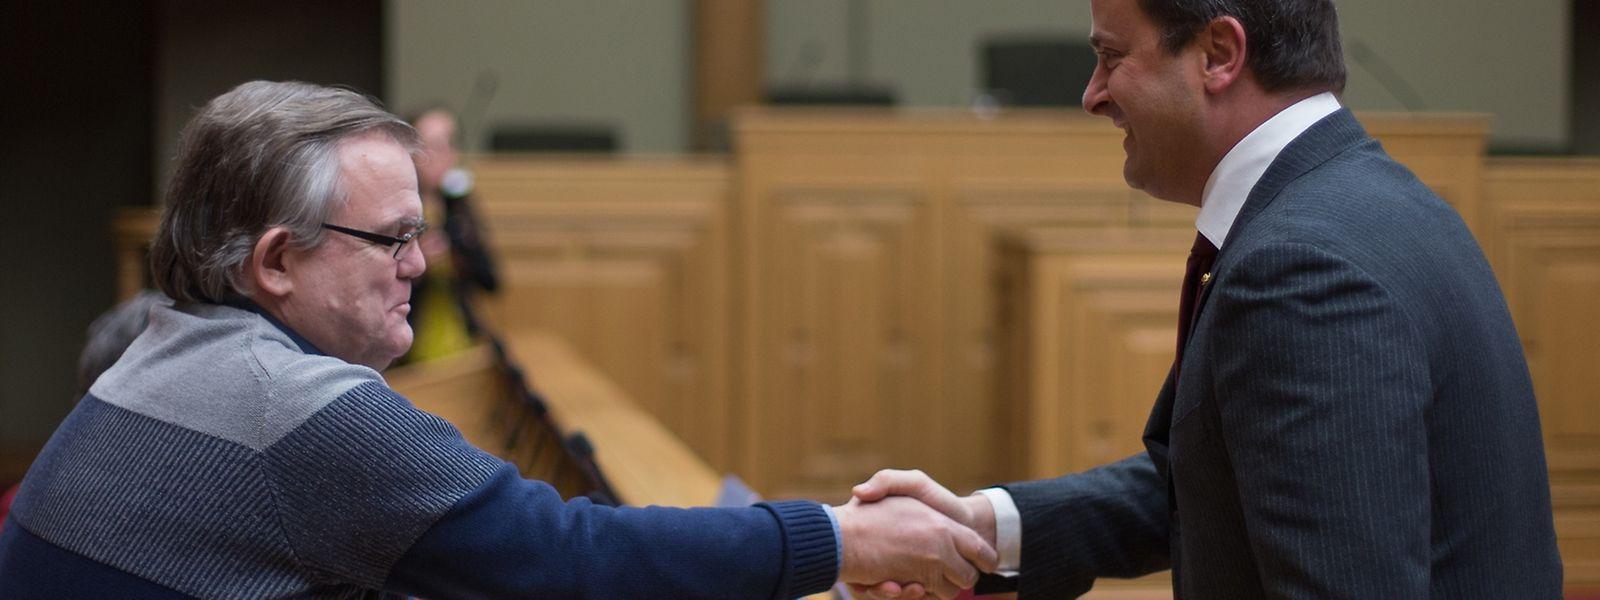 Petitionär Lucien Welter bei der Begrüßung im Chamberplenum durch Premierminister Xavier Bettel.